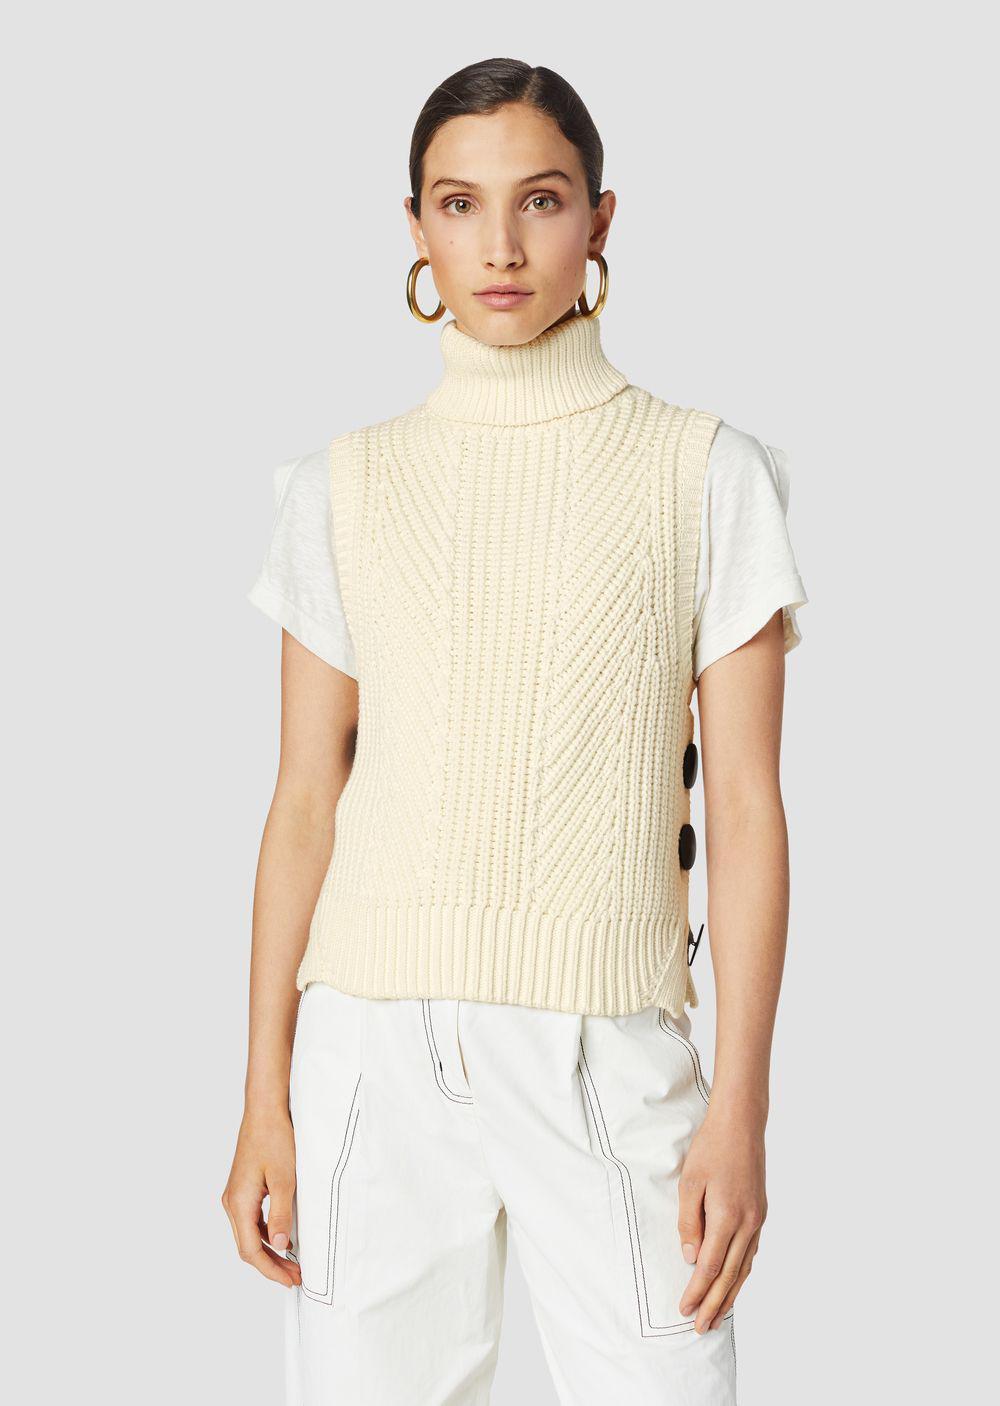 385ba63b82c 10 Crosby Derek Lam. Women s White Ribbed Cotton-blend Sleeveless  Turtleneck Sweater